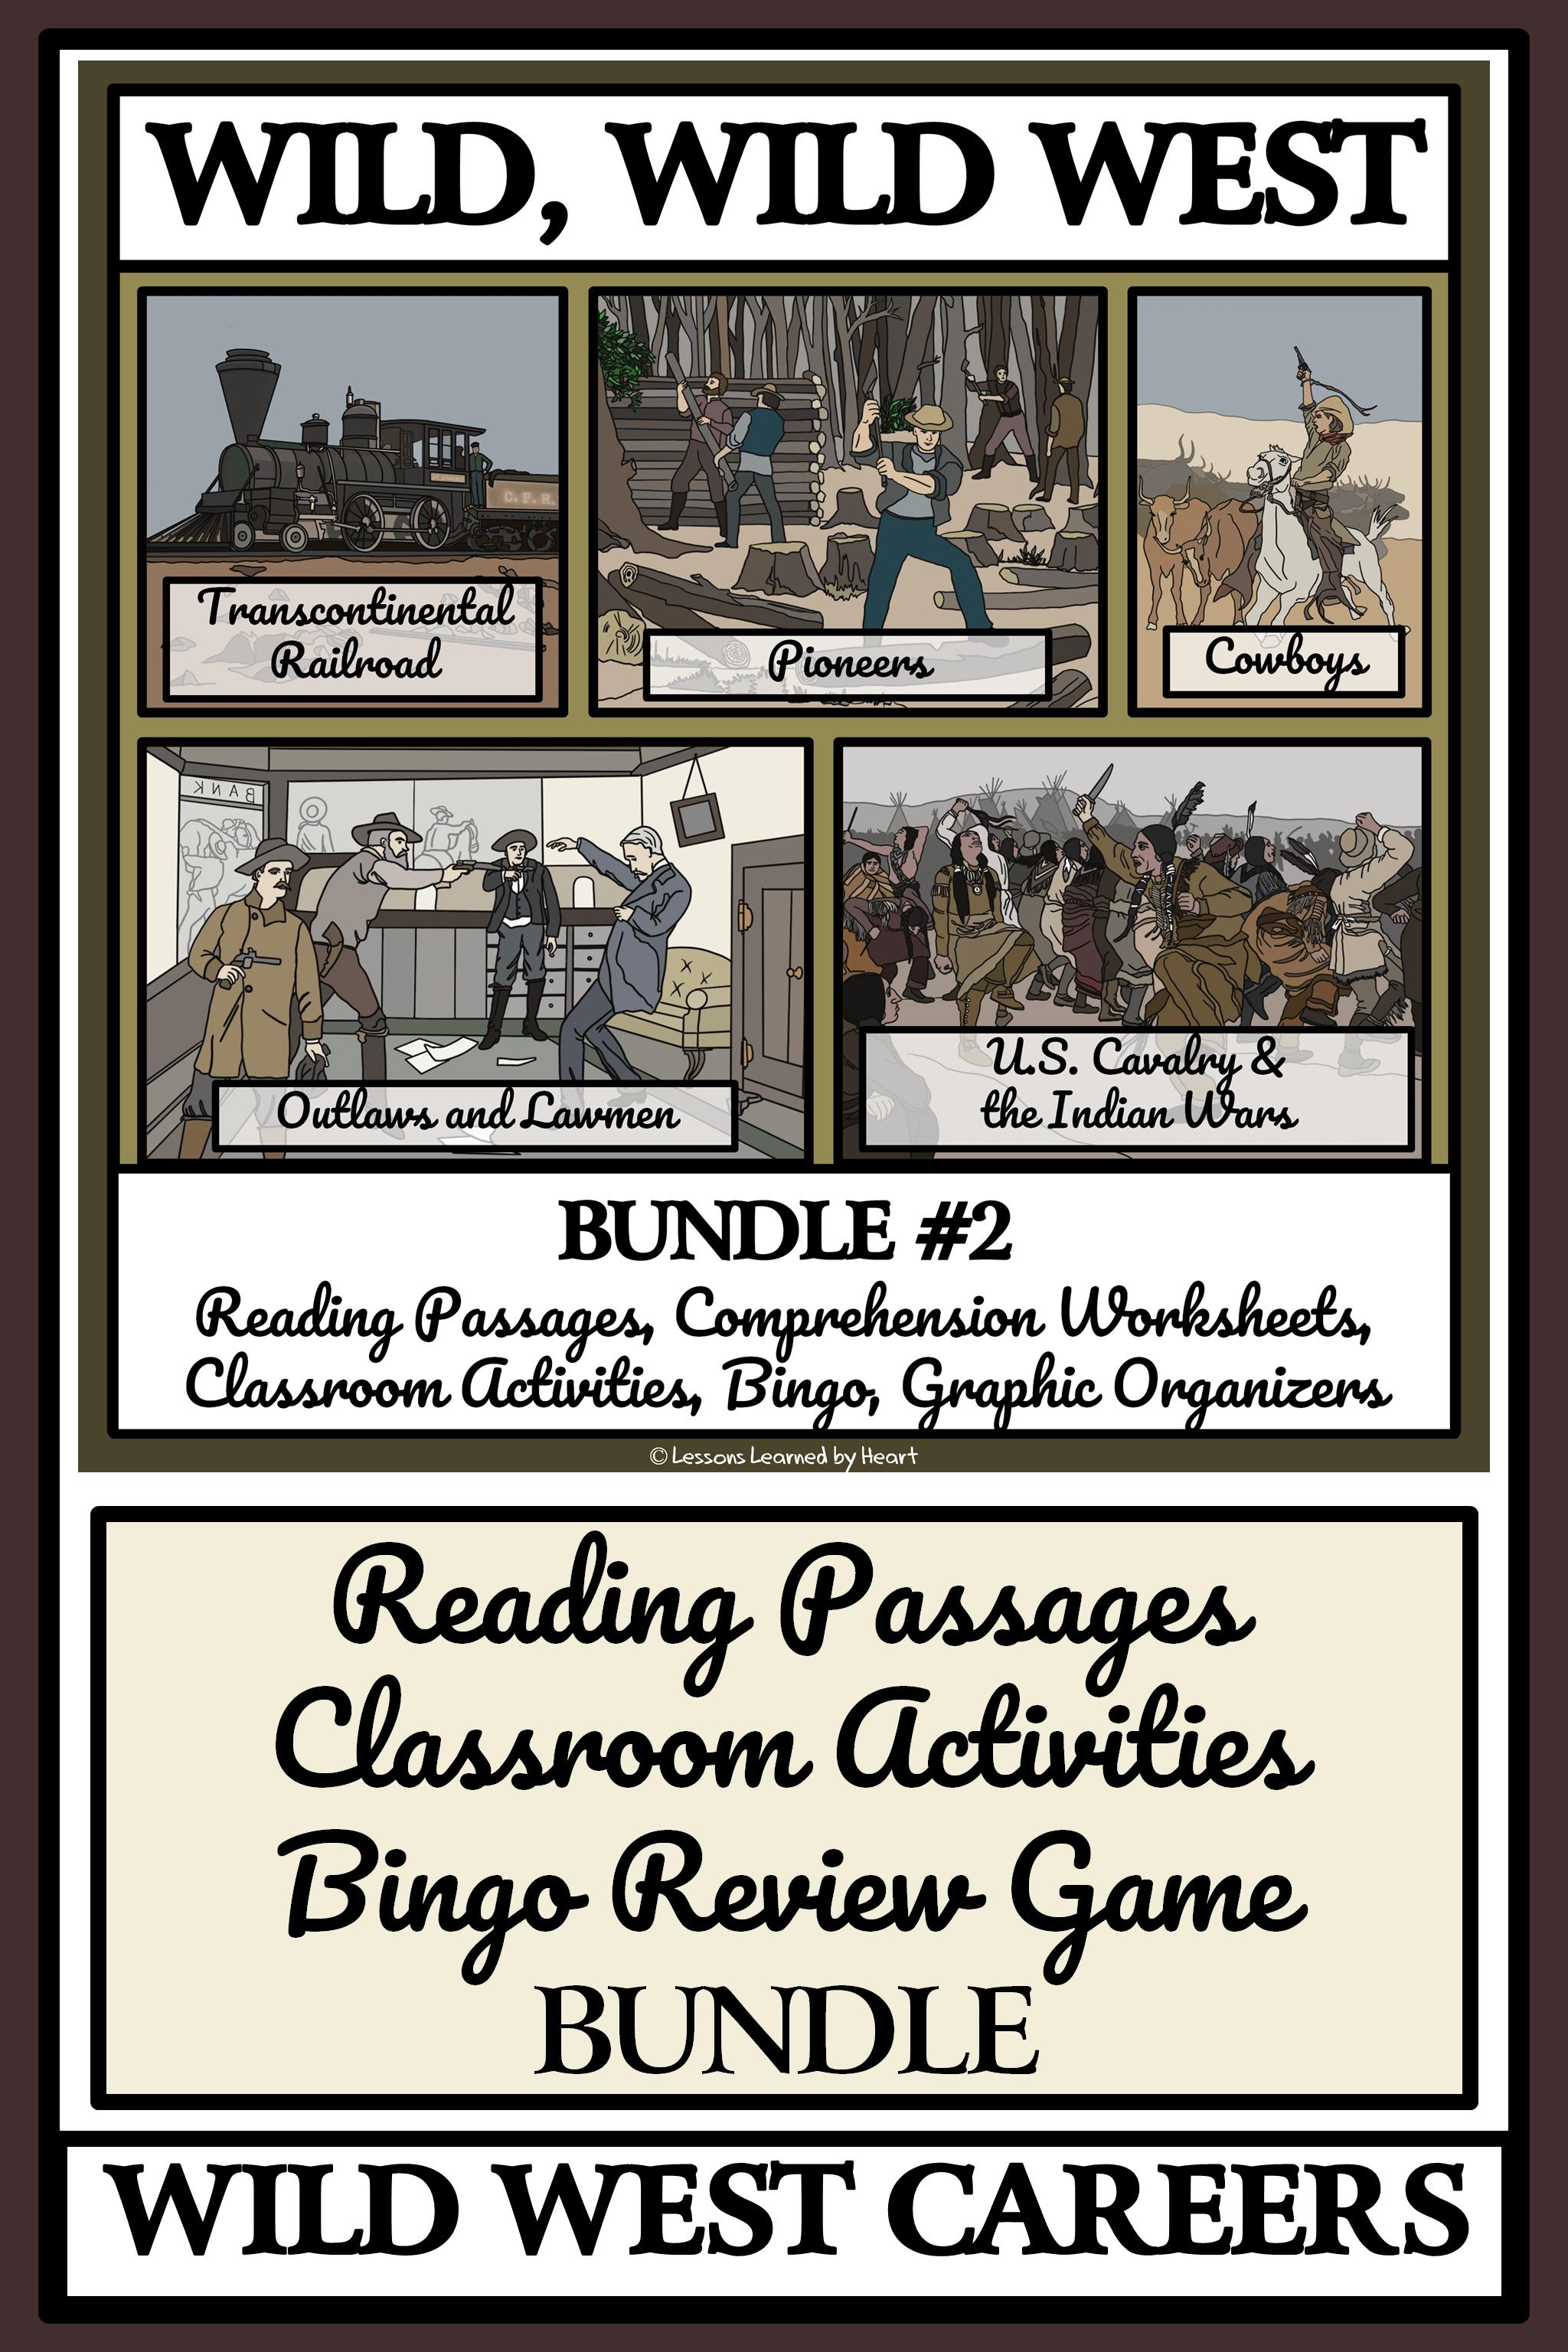 Wild West Life Bundle 2 Reading Passages And Classroom Activities Reading Passages Classroom Activities Activities [ 3072 x 2048 Pixel ]